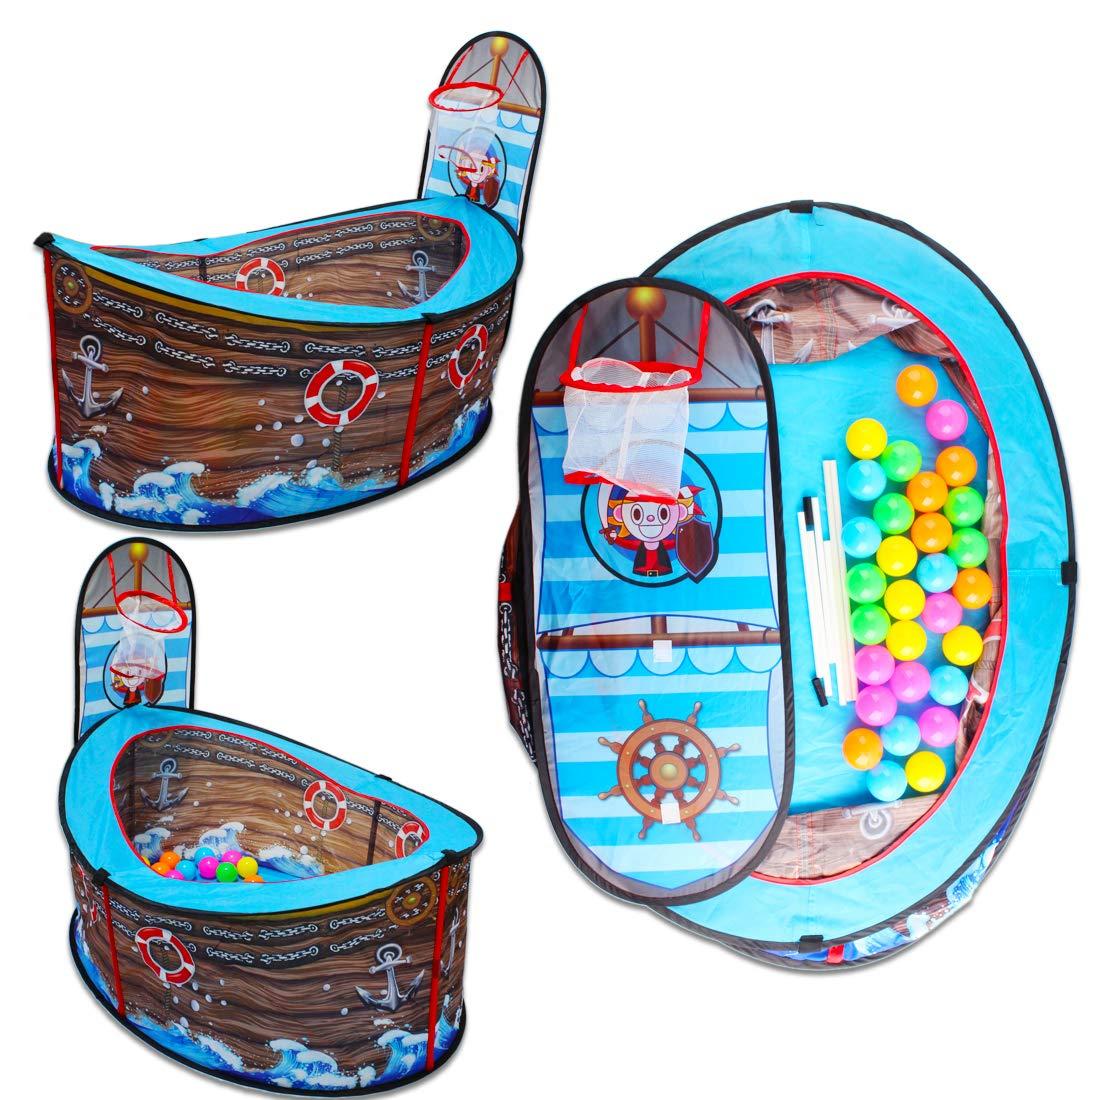 deAO Barco Pirata Tienda de Juegos Piscina de Bolas con Aro de ...